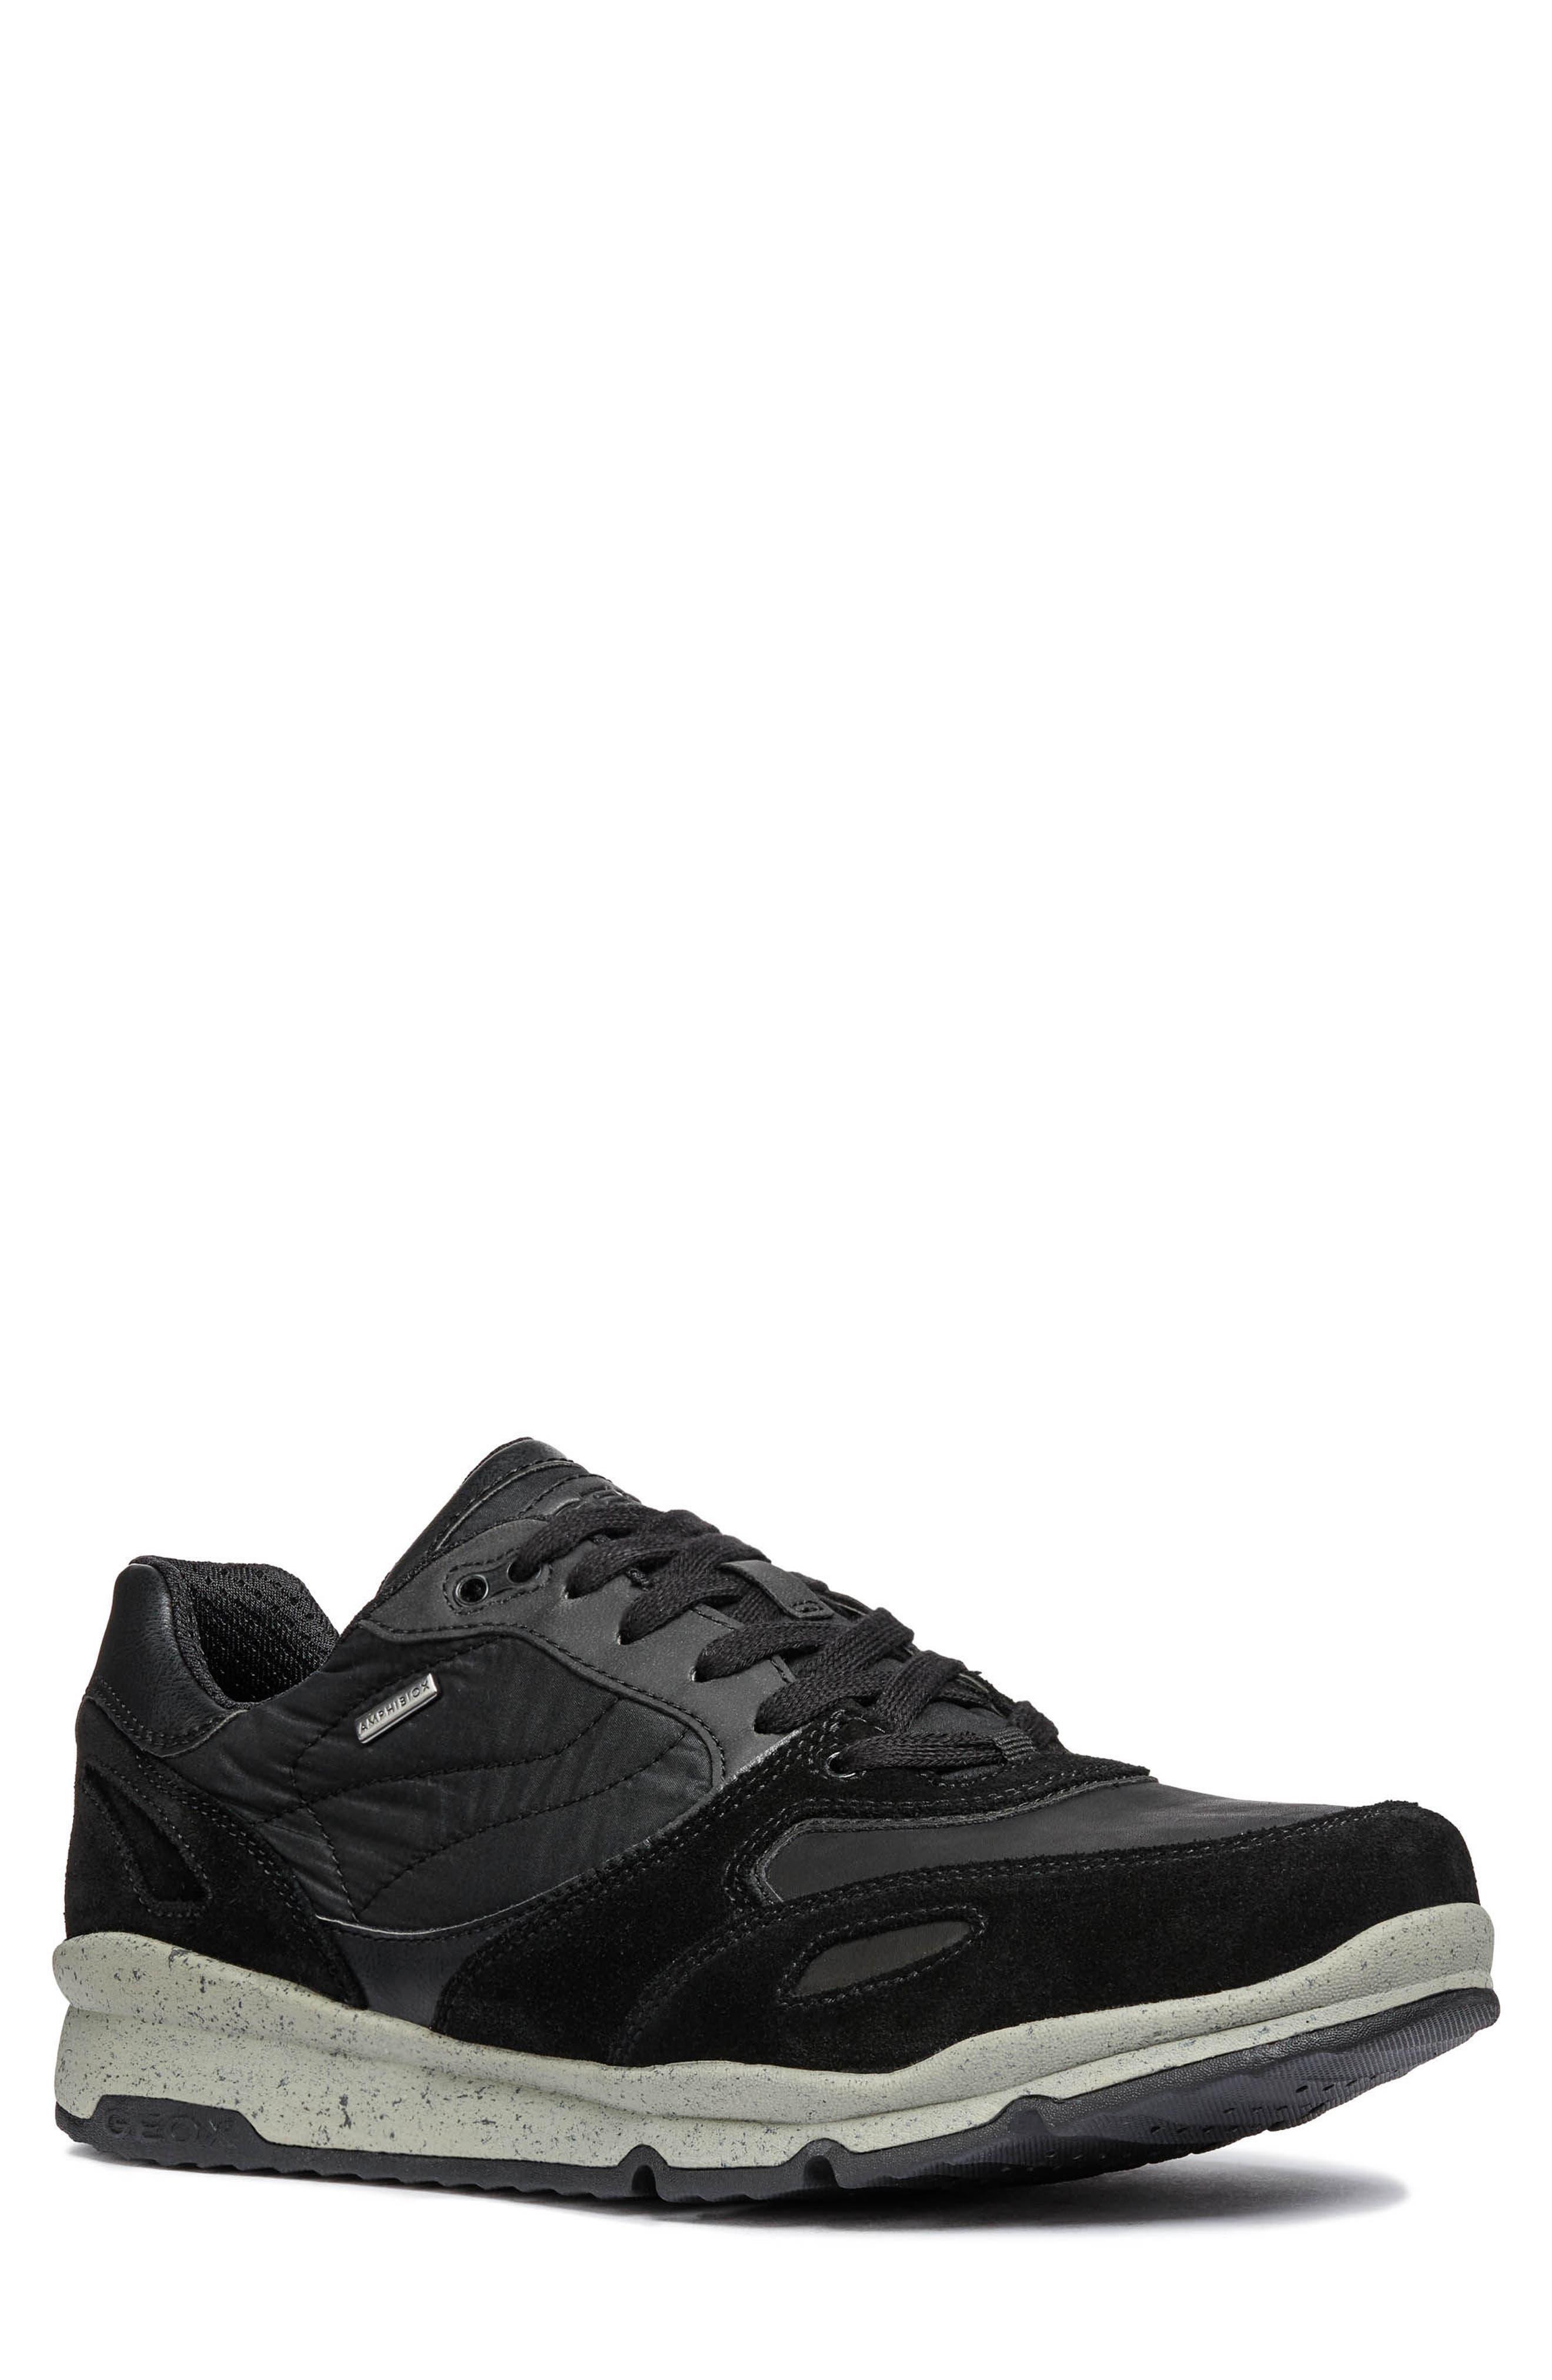 Sandro ABX Ambphibiox Waterproof Sneaker,                             Main thumbnail 1, color,                             007